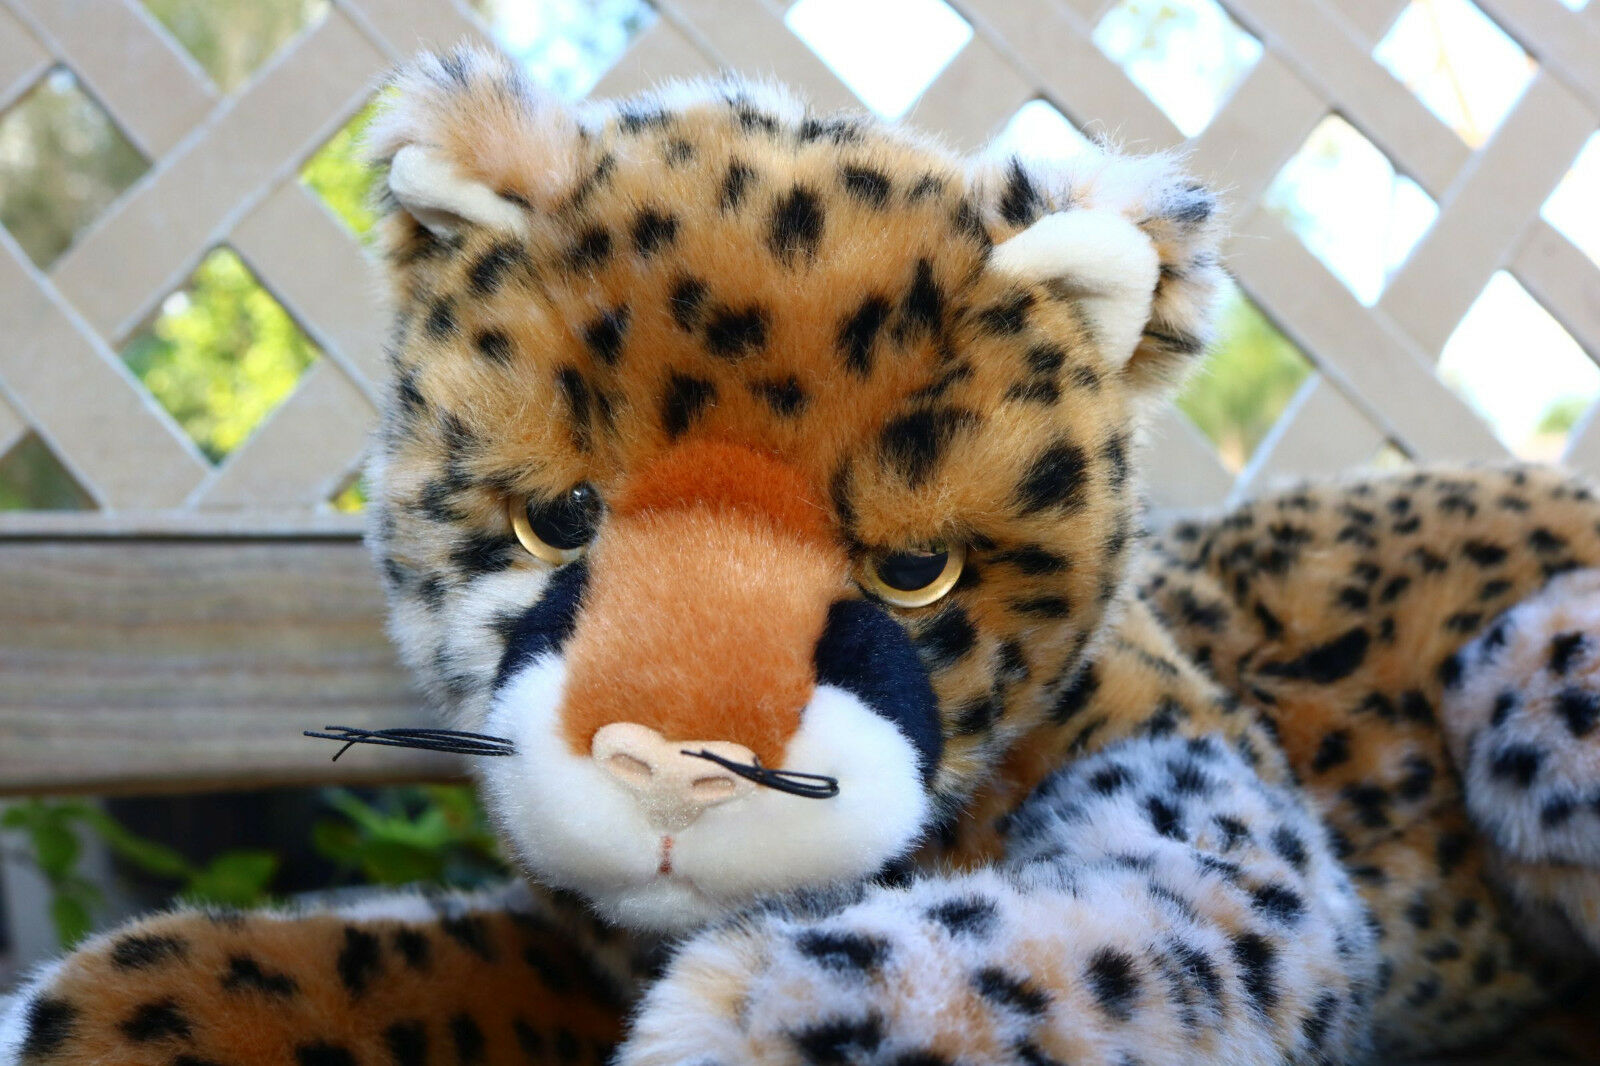 Spotted Baby Leopard Cheetah Cub Cat Stuffed Animal Cute Plush Toy Grumpy 12